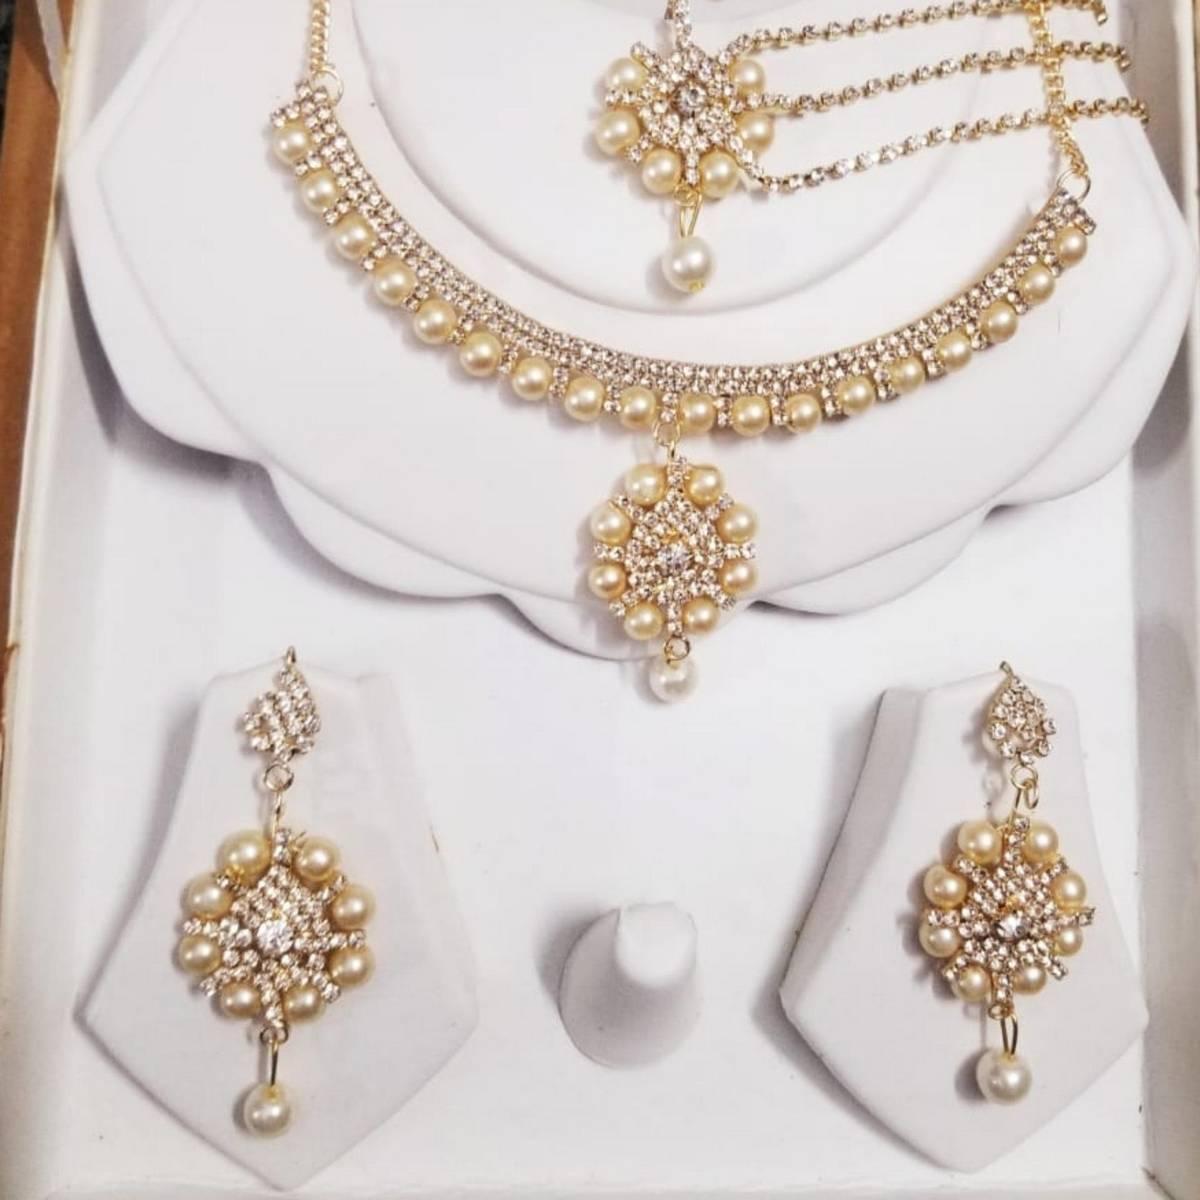 La Moda Golden Zircon Jewellery Set with White Pearl